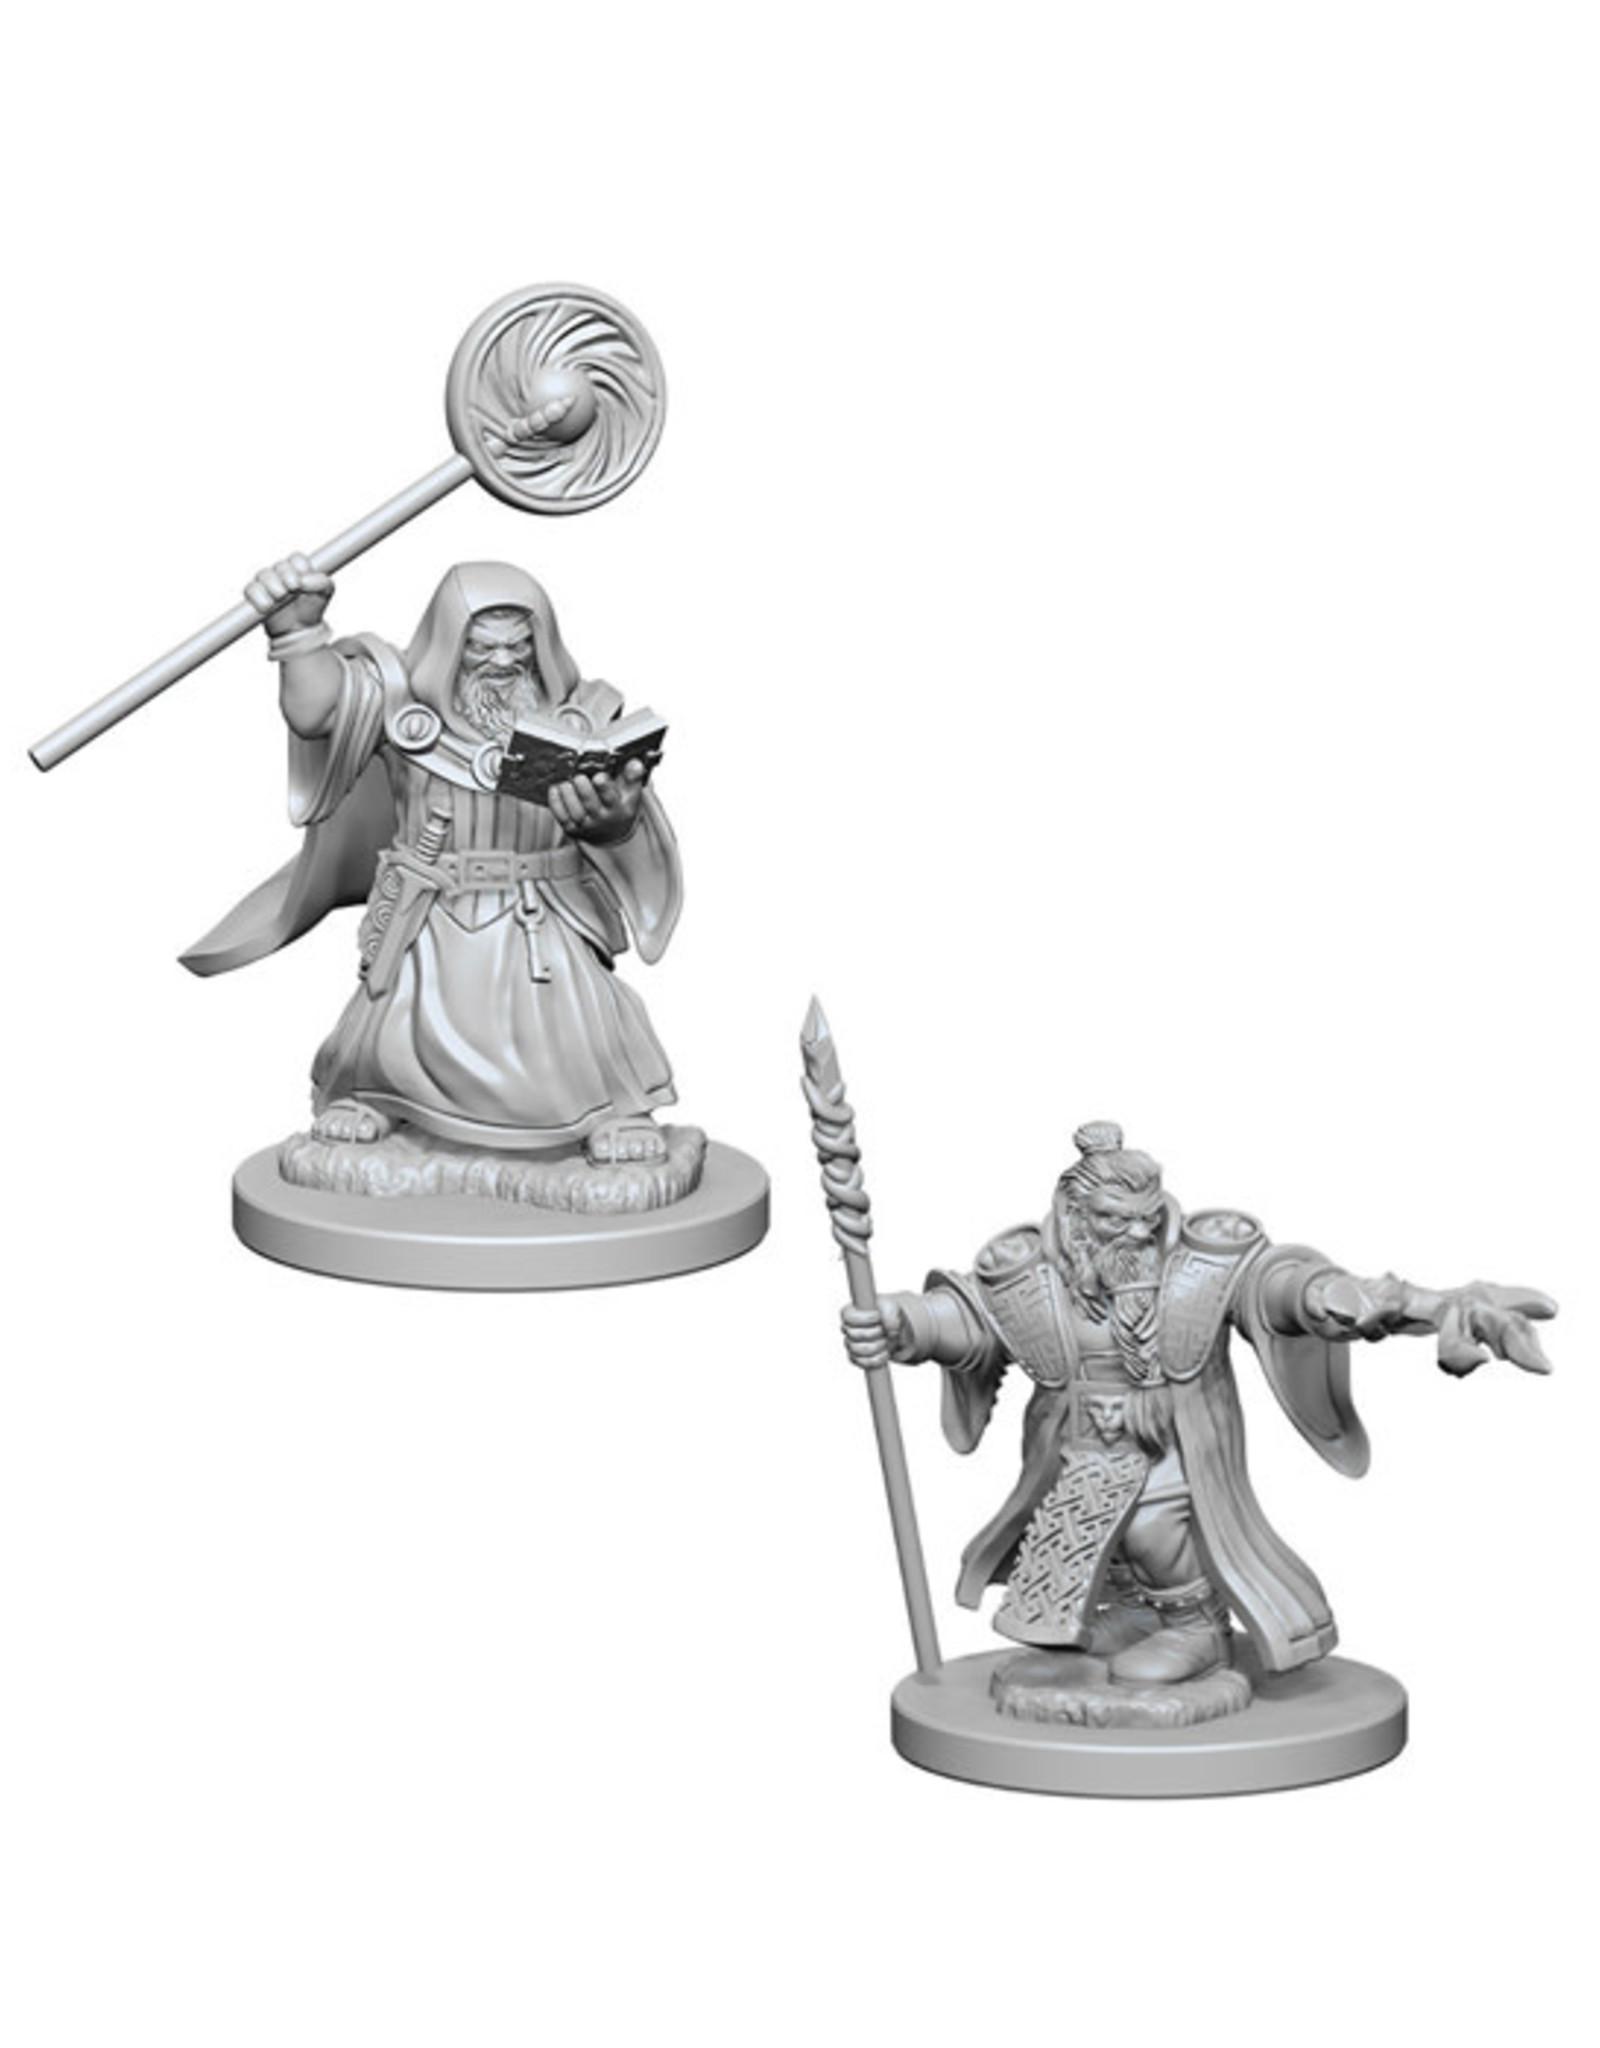 Dungeons & Dragons Dungeons & Dragons: Nolzur's - Dwarf Male Wizard